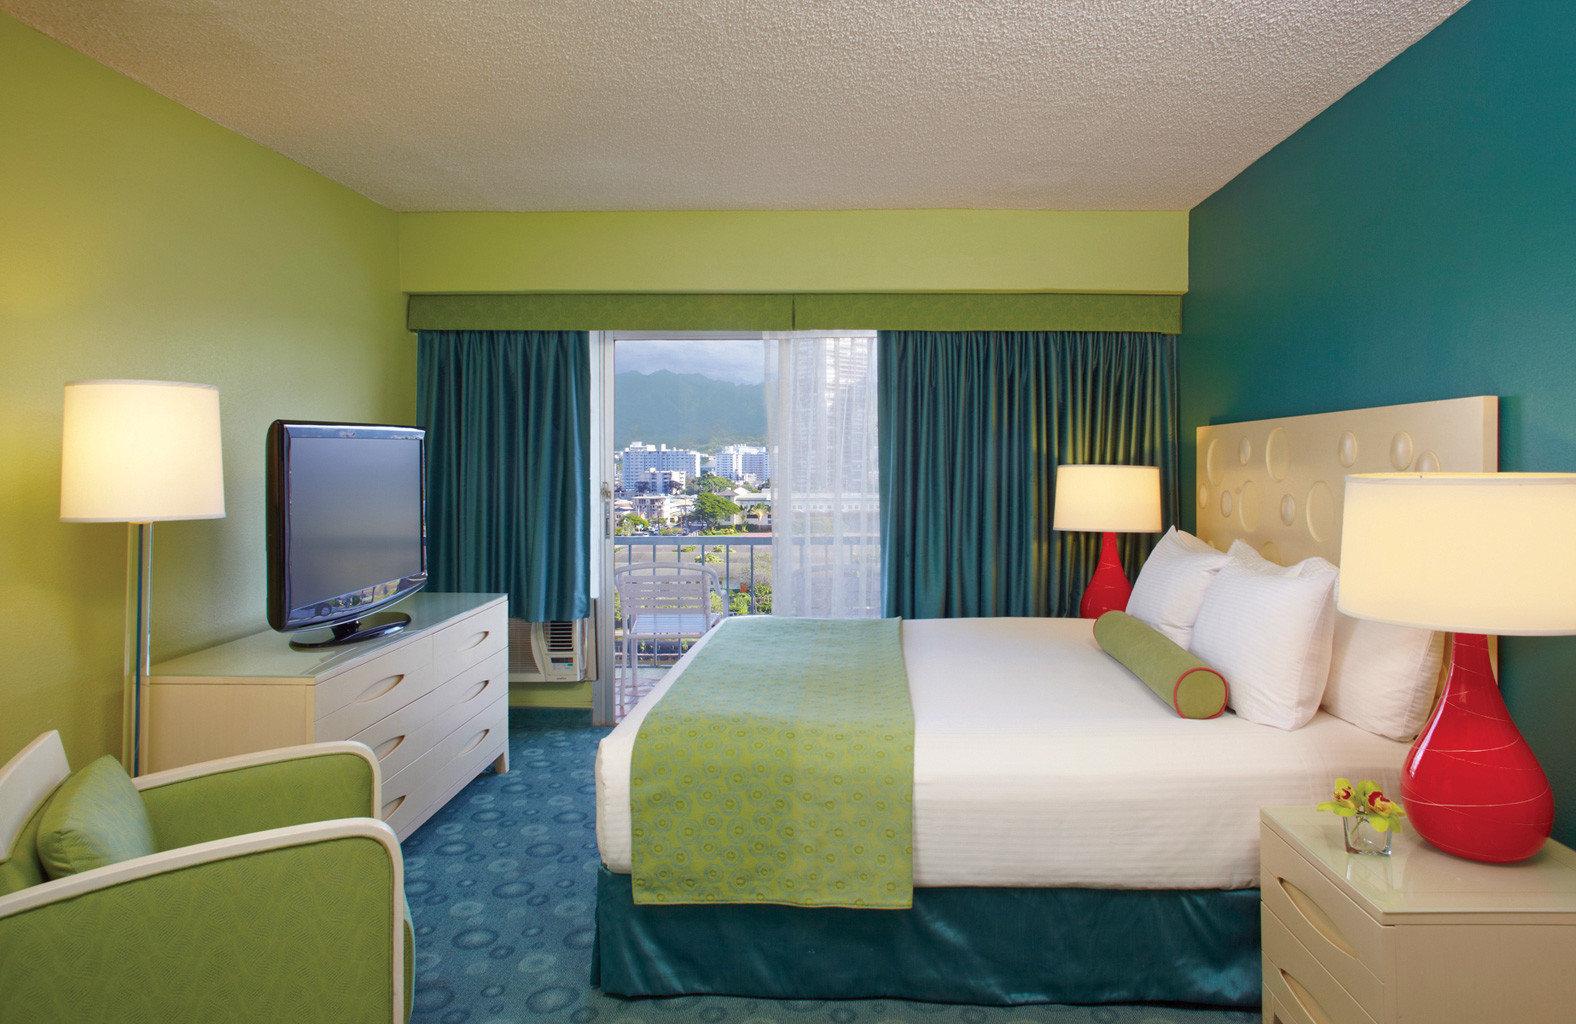 Bedroom Boutique Budget sofa property Suite green condominium living room yellow lamp